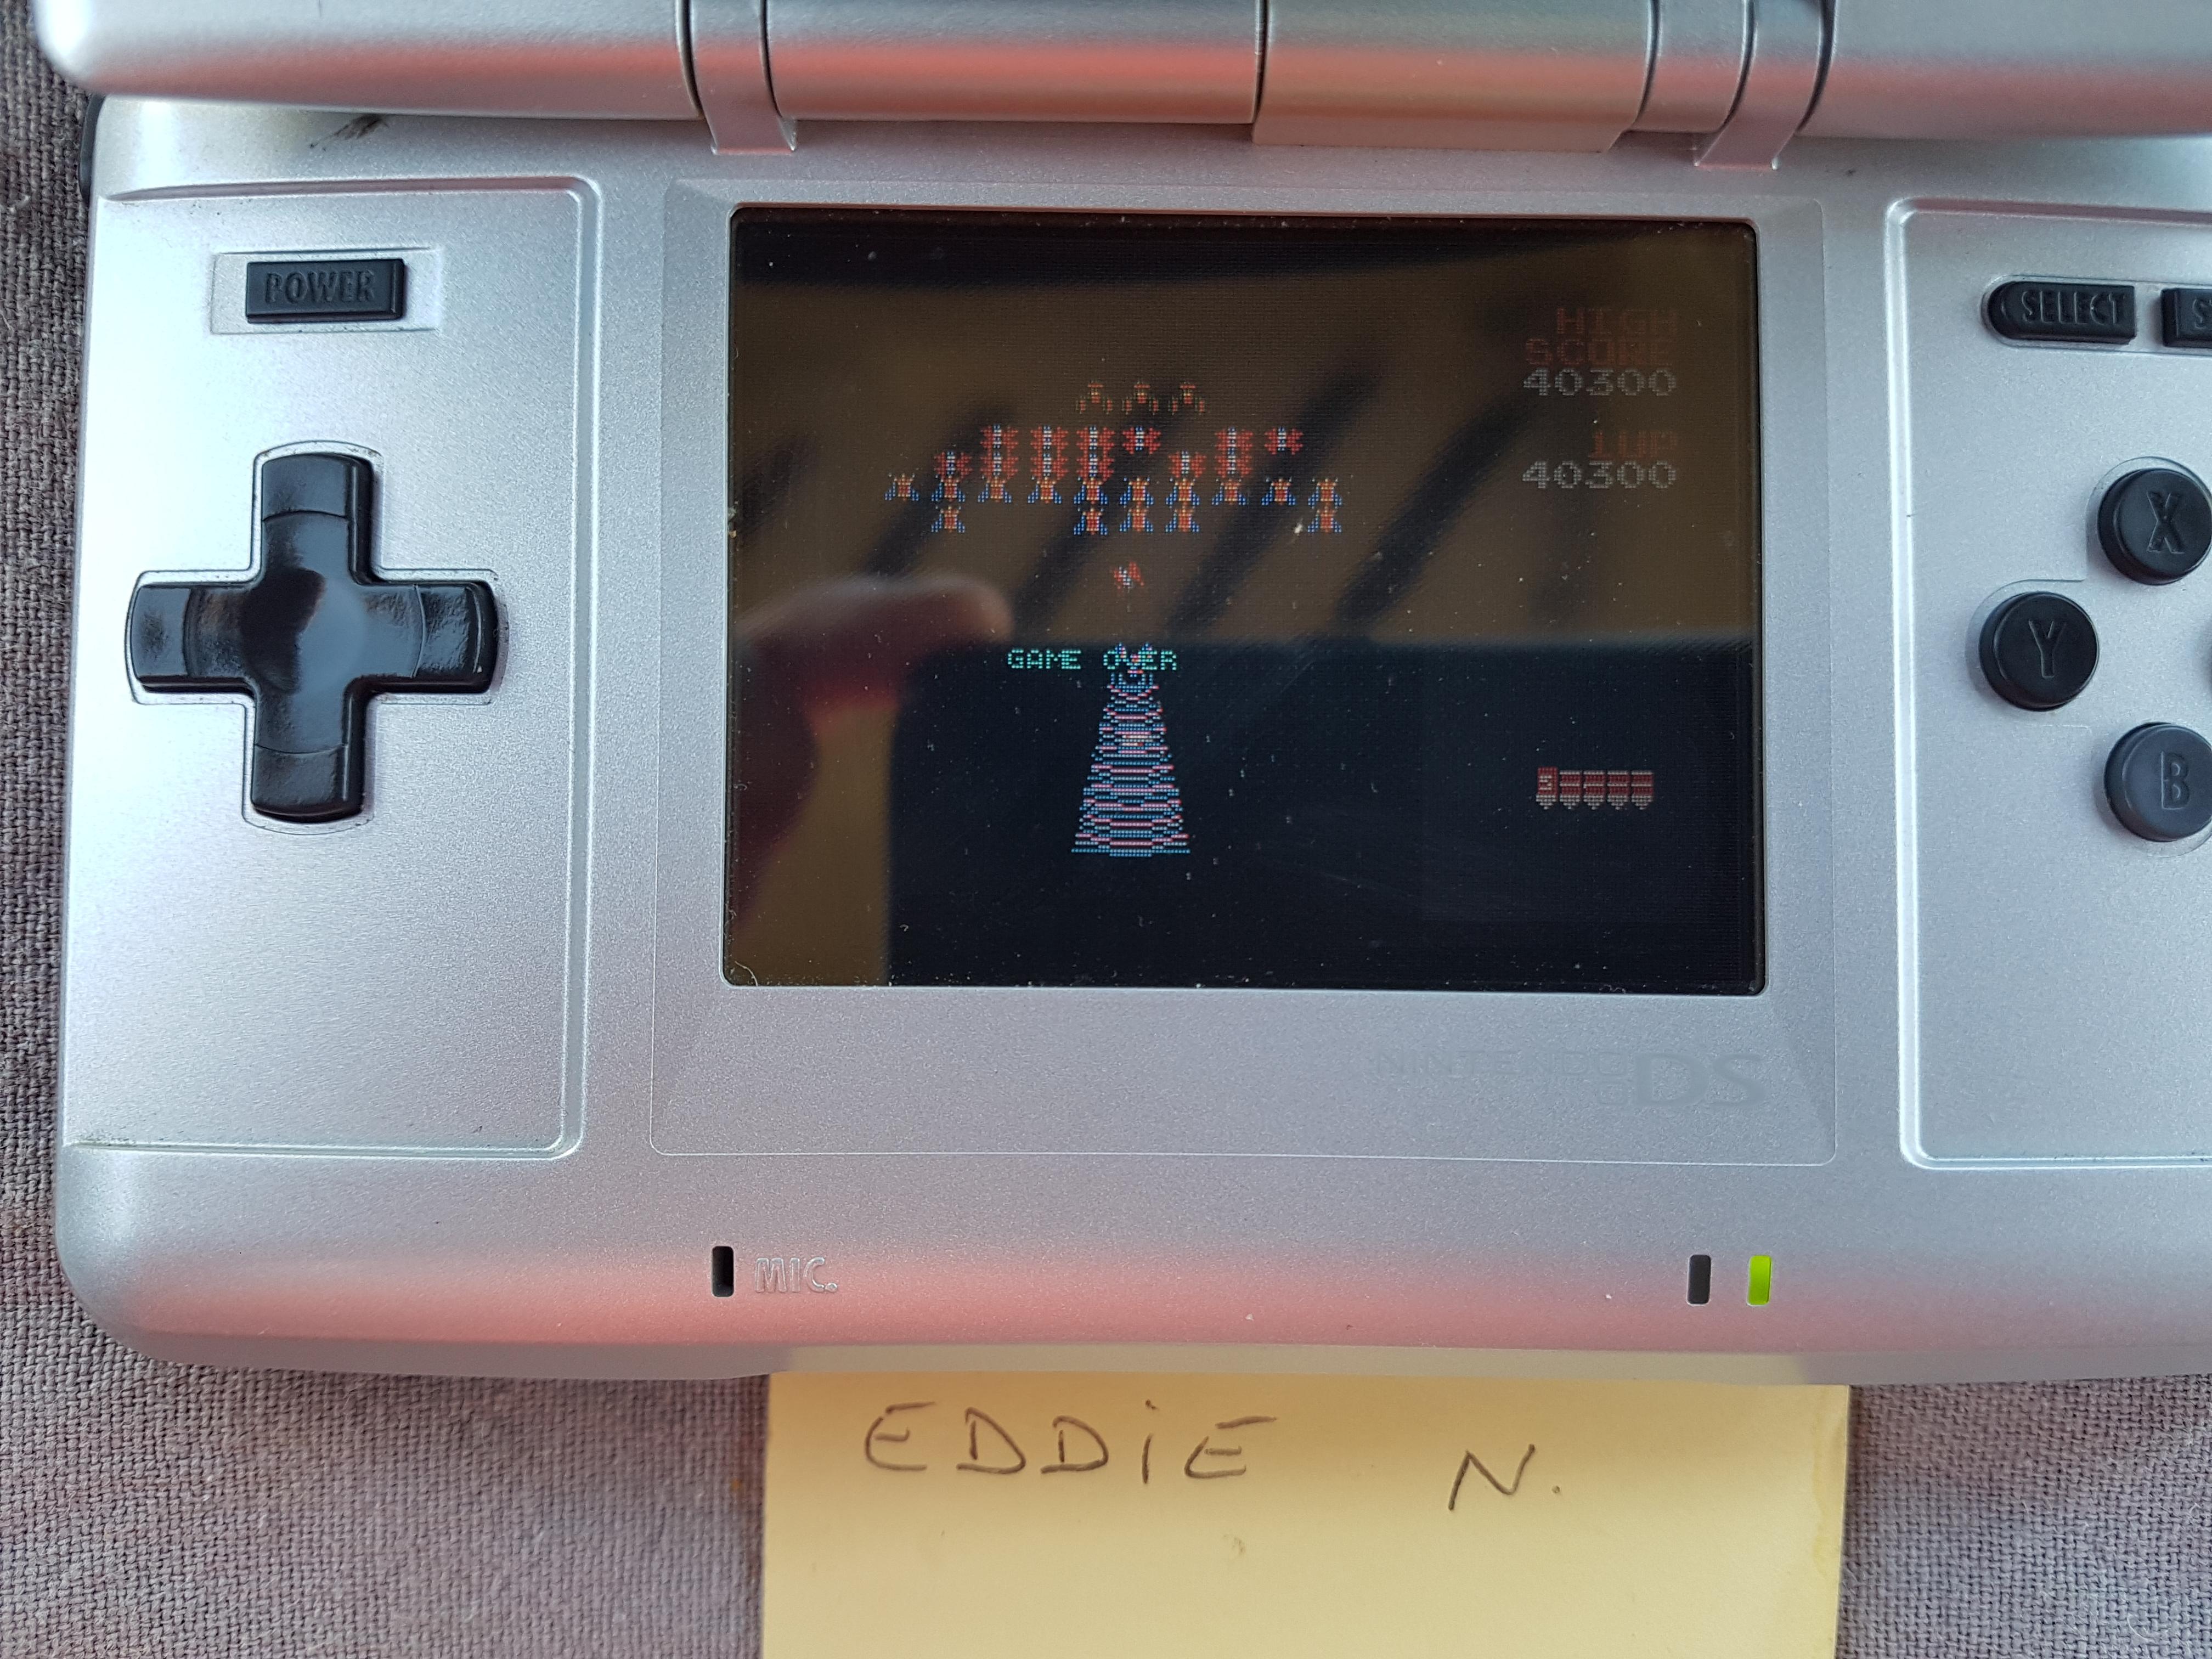 EddieNiceguy: Namco Museum: Galaga (GBA) 40,300 points on 2018-02-02 05:53:16